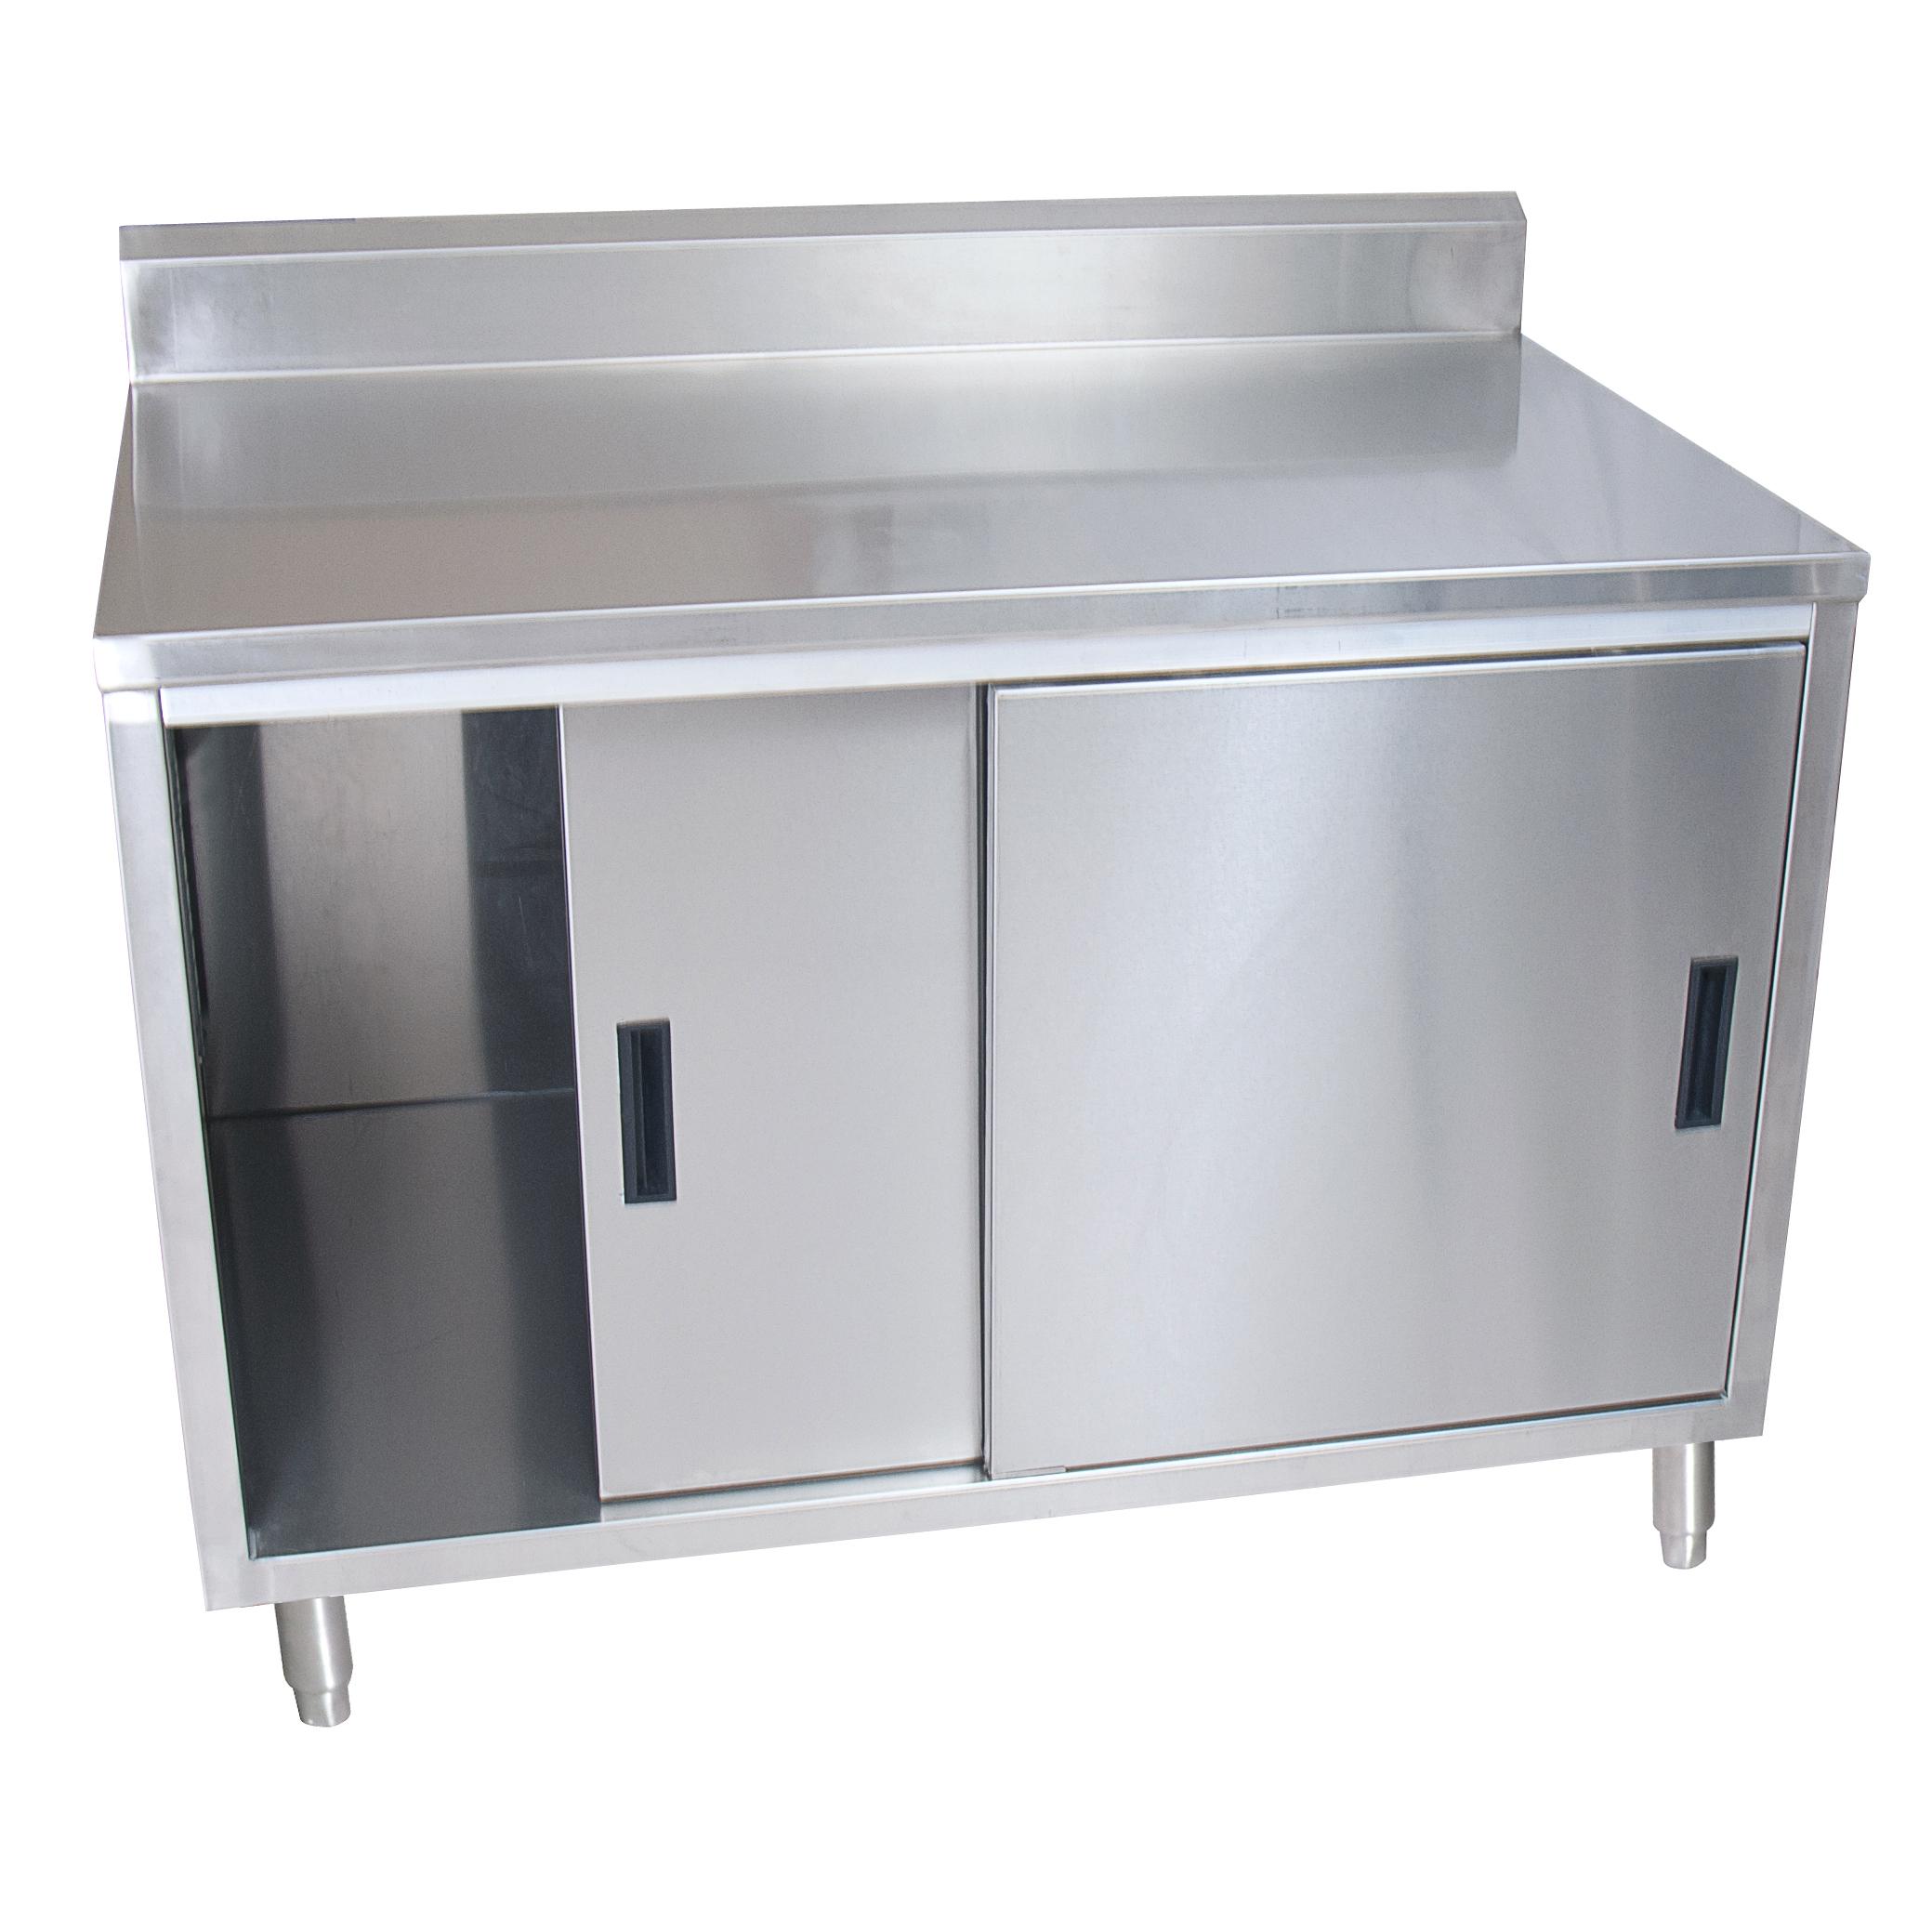 BK Resources BKDCR5-3648S work table, cabinet base sliding doors